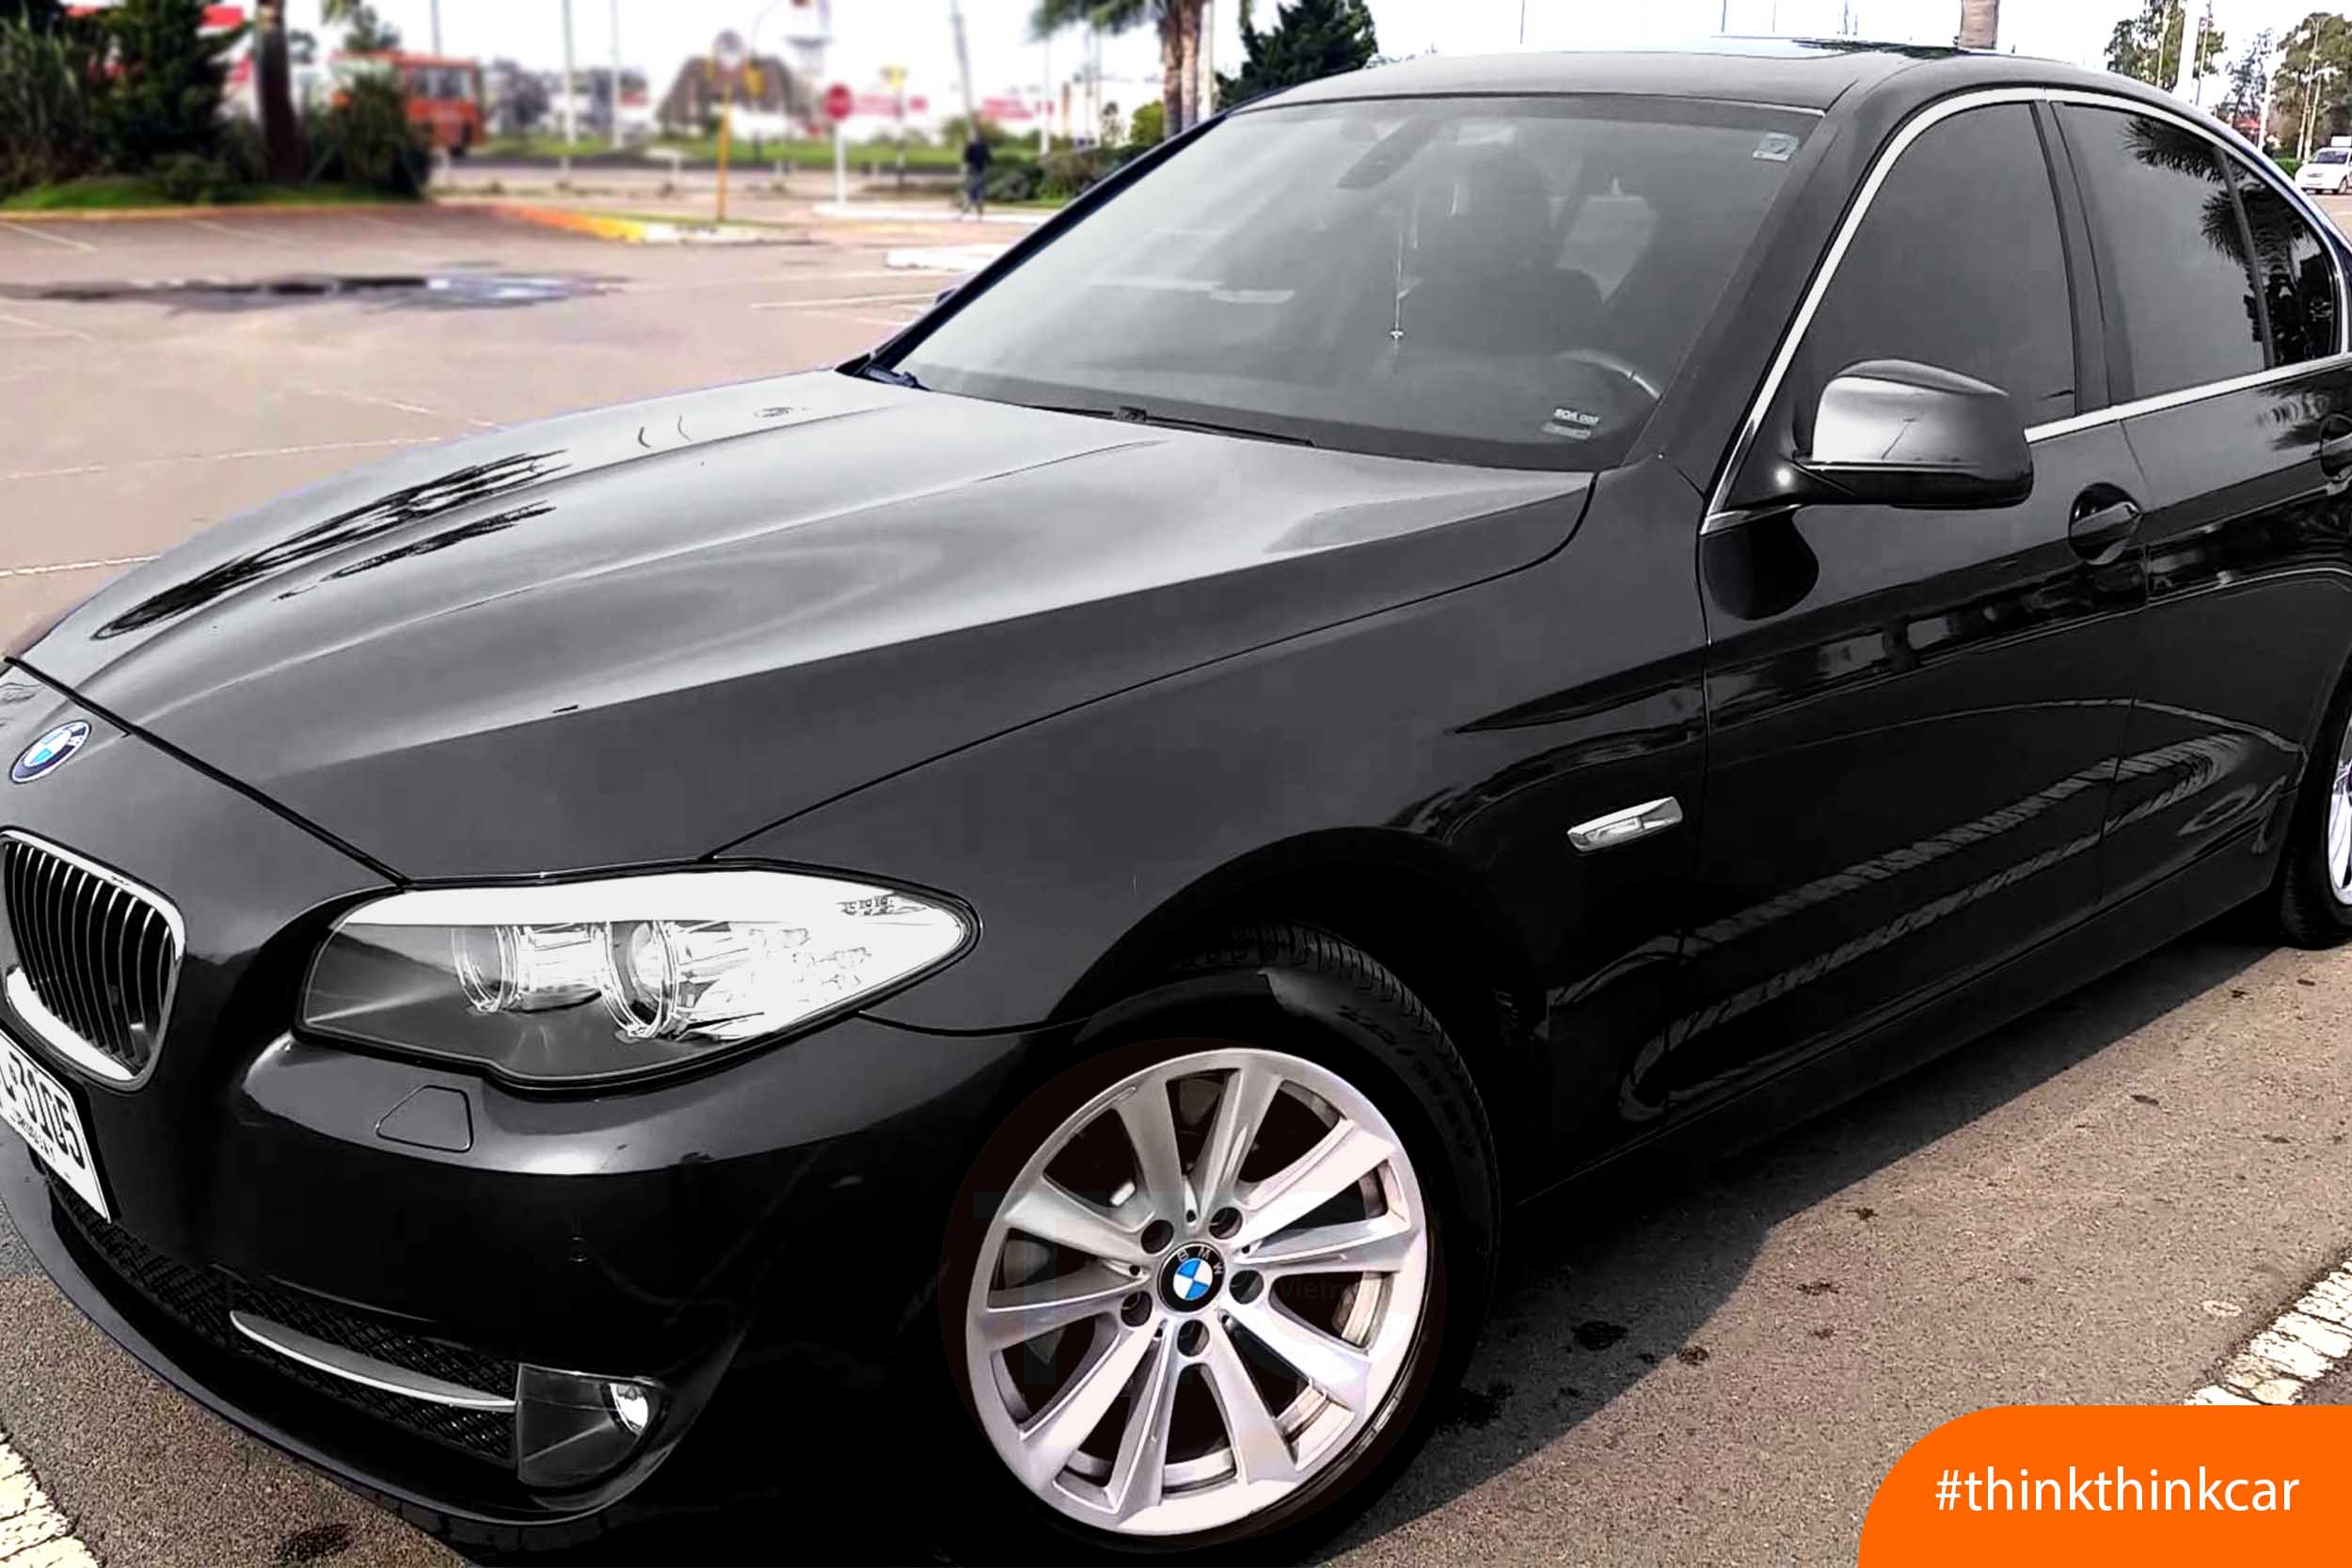 BMW 523i lắp đệm giảm chấn TTC Urethane